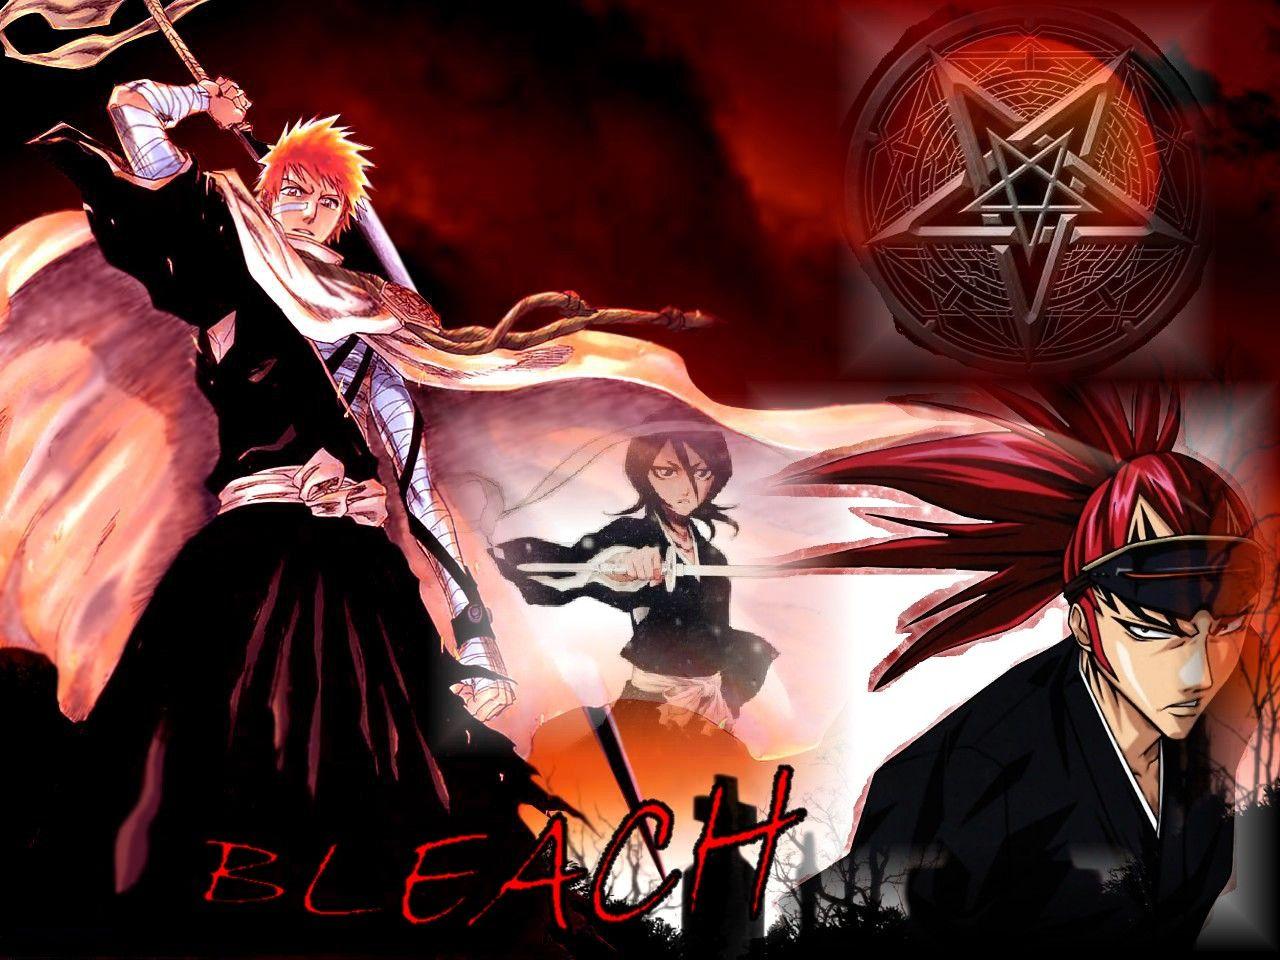 Ichigo Rukia Renji Bleach Wallpaper backgrounds Bleach 1280x960